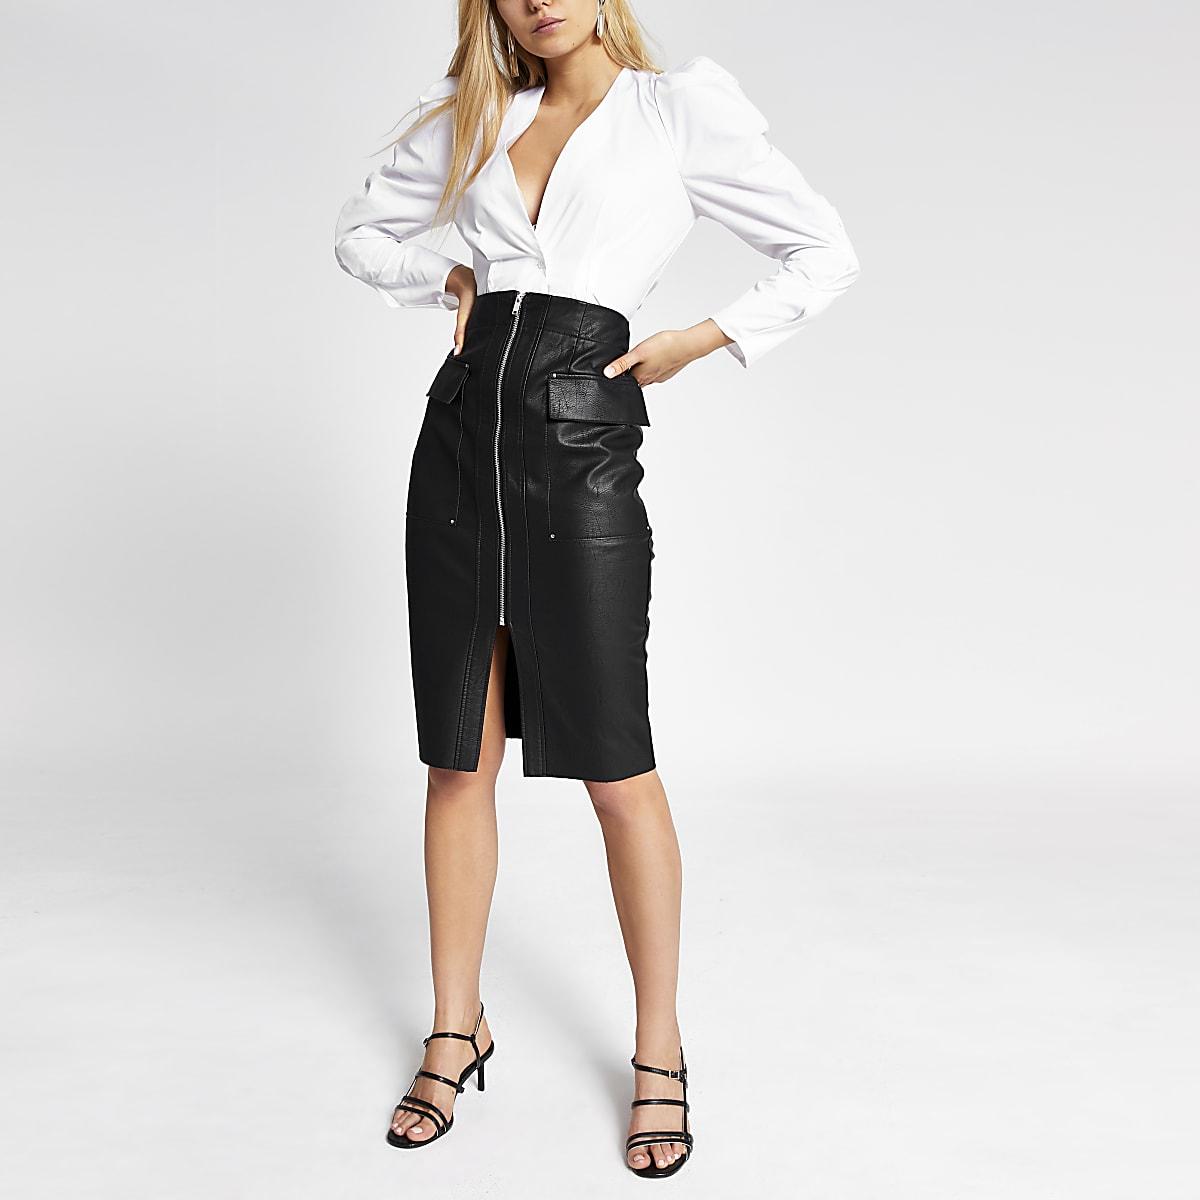 Black faux leather utility pencil skirt